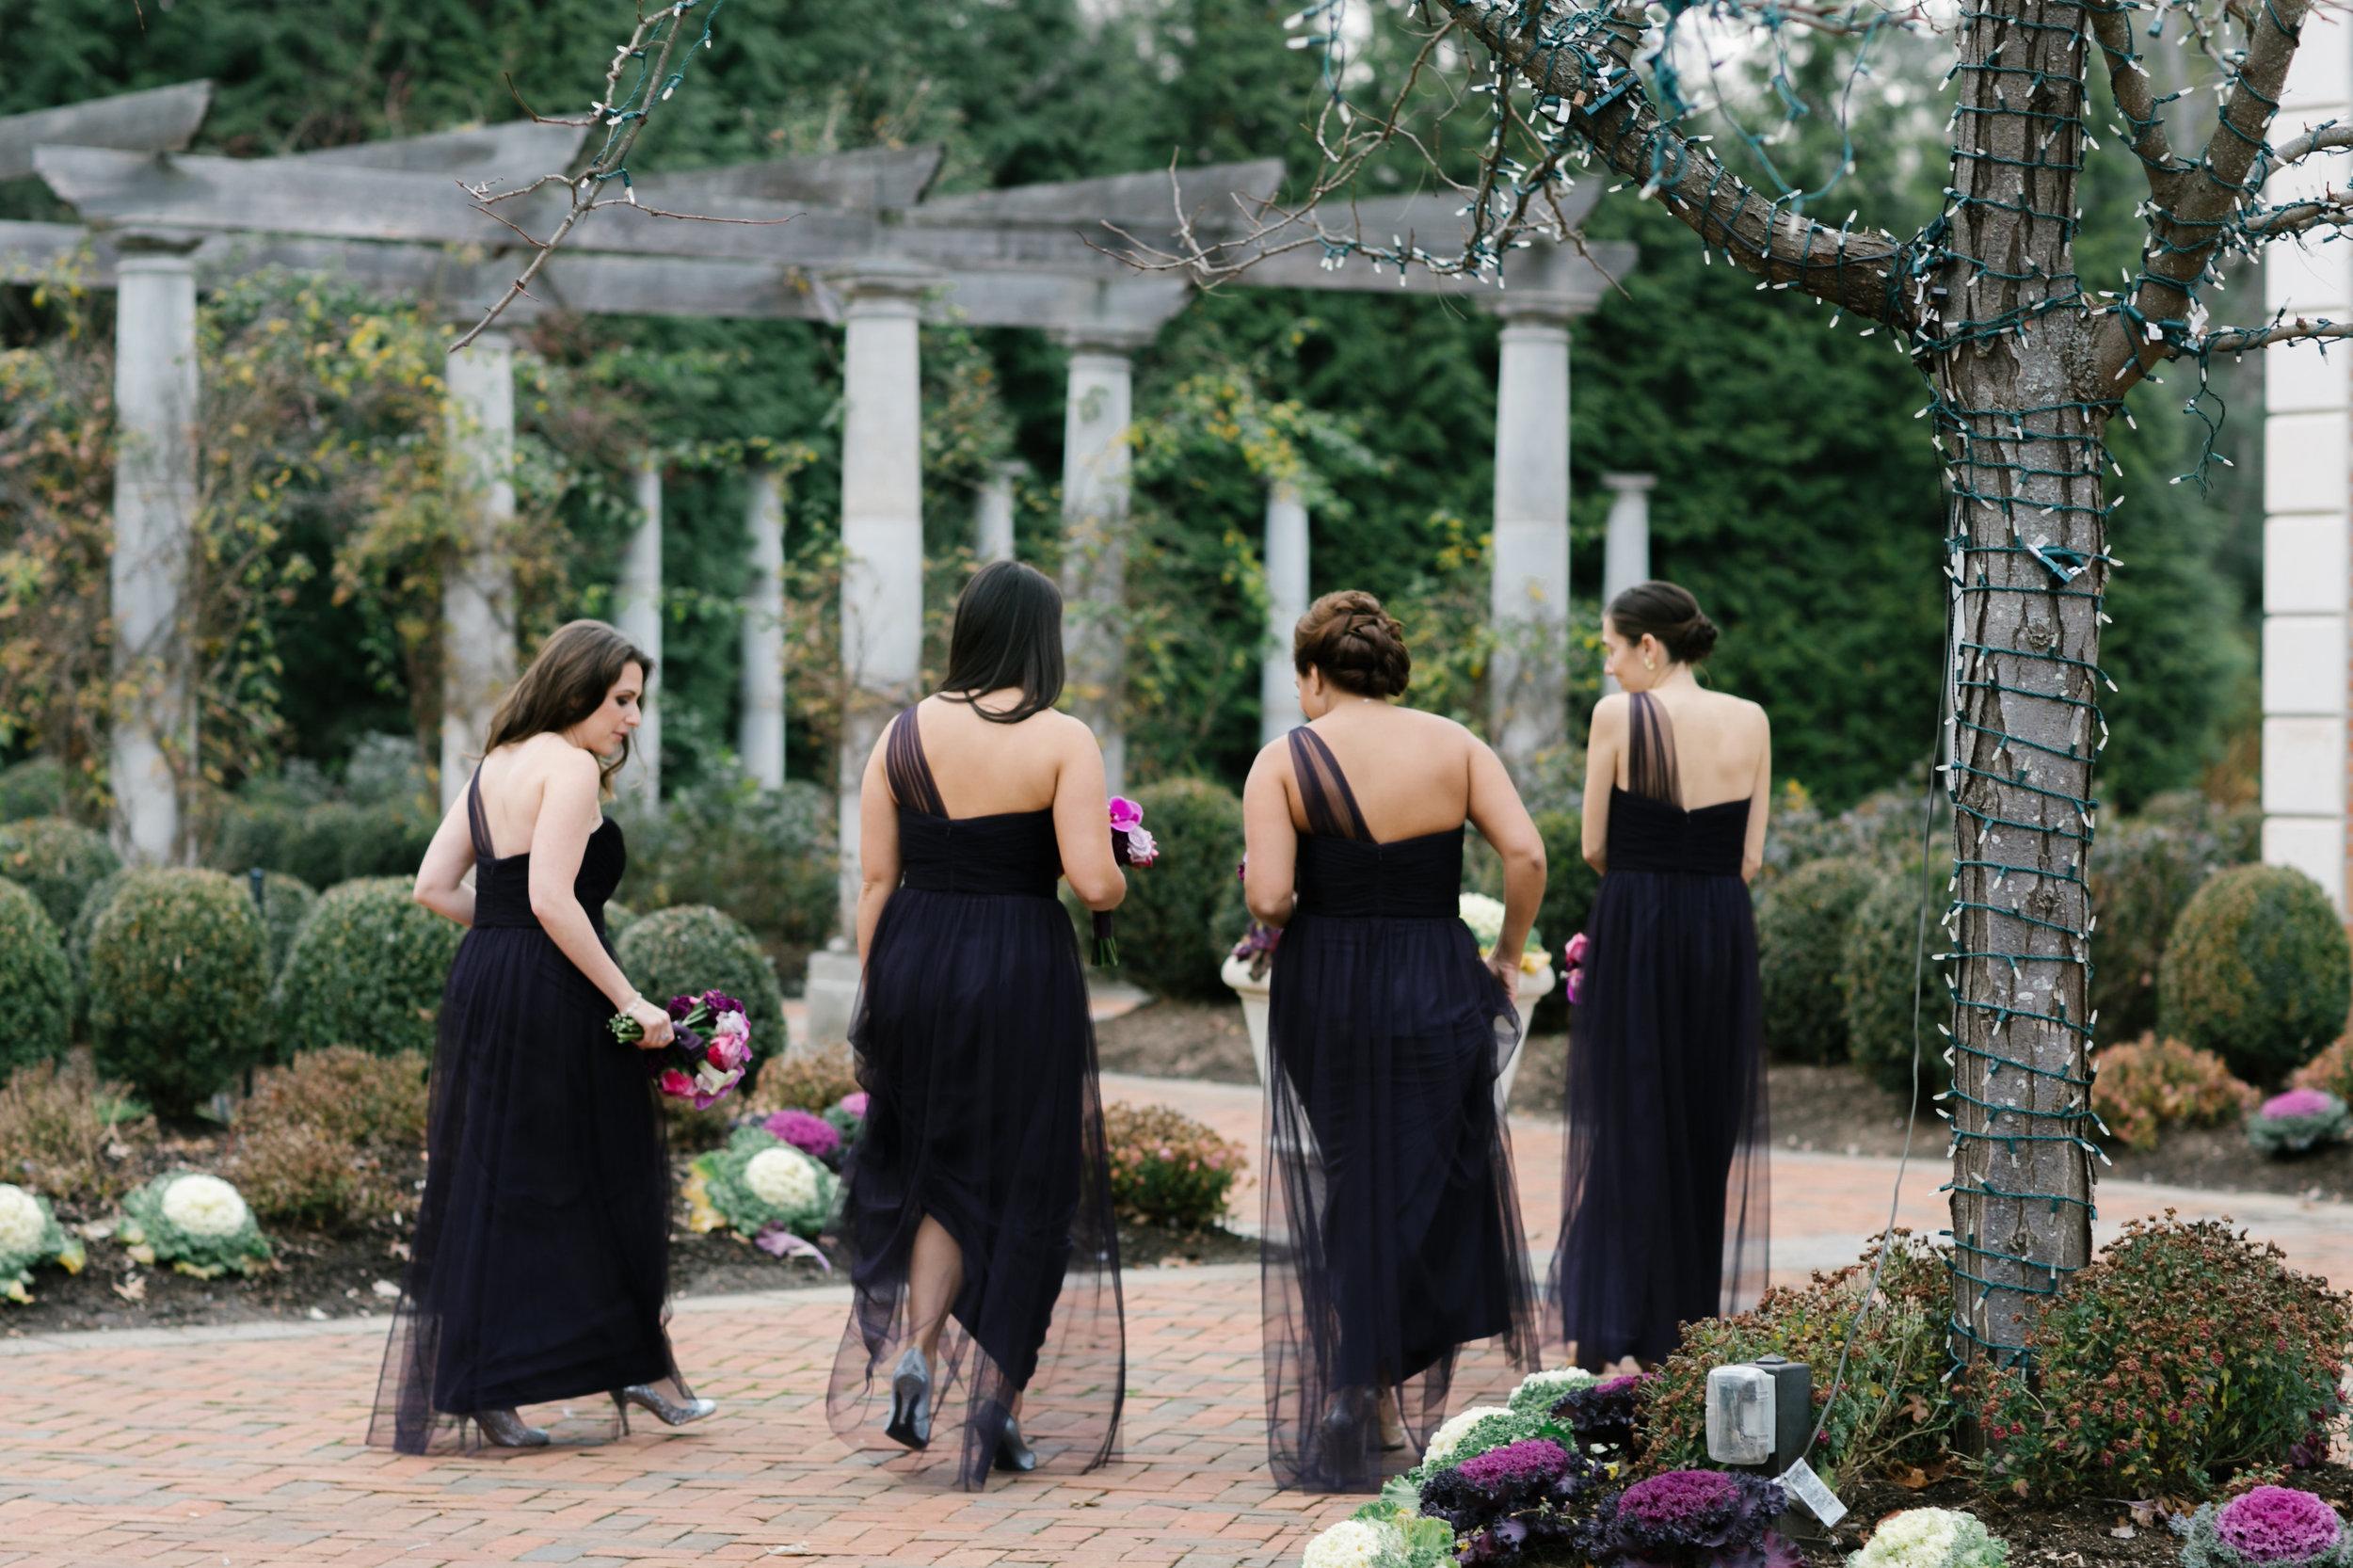 Ceci_New_York_Custom_Invitation_ New_Jersey_Wedding_Luxury_Personalized_Ceci_Style_Bride_Foil_Stamping27.jpg